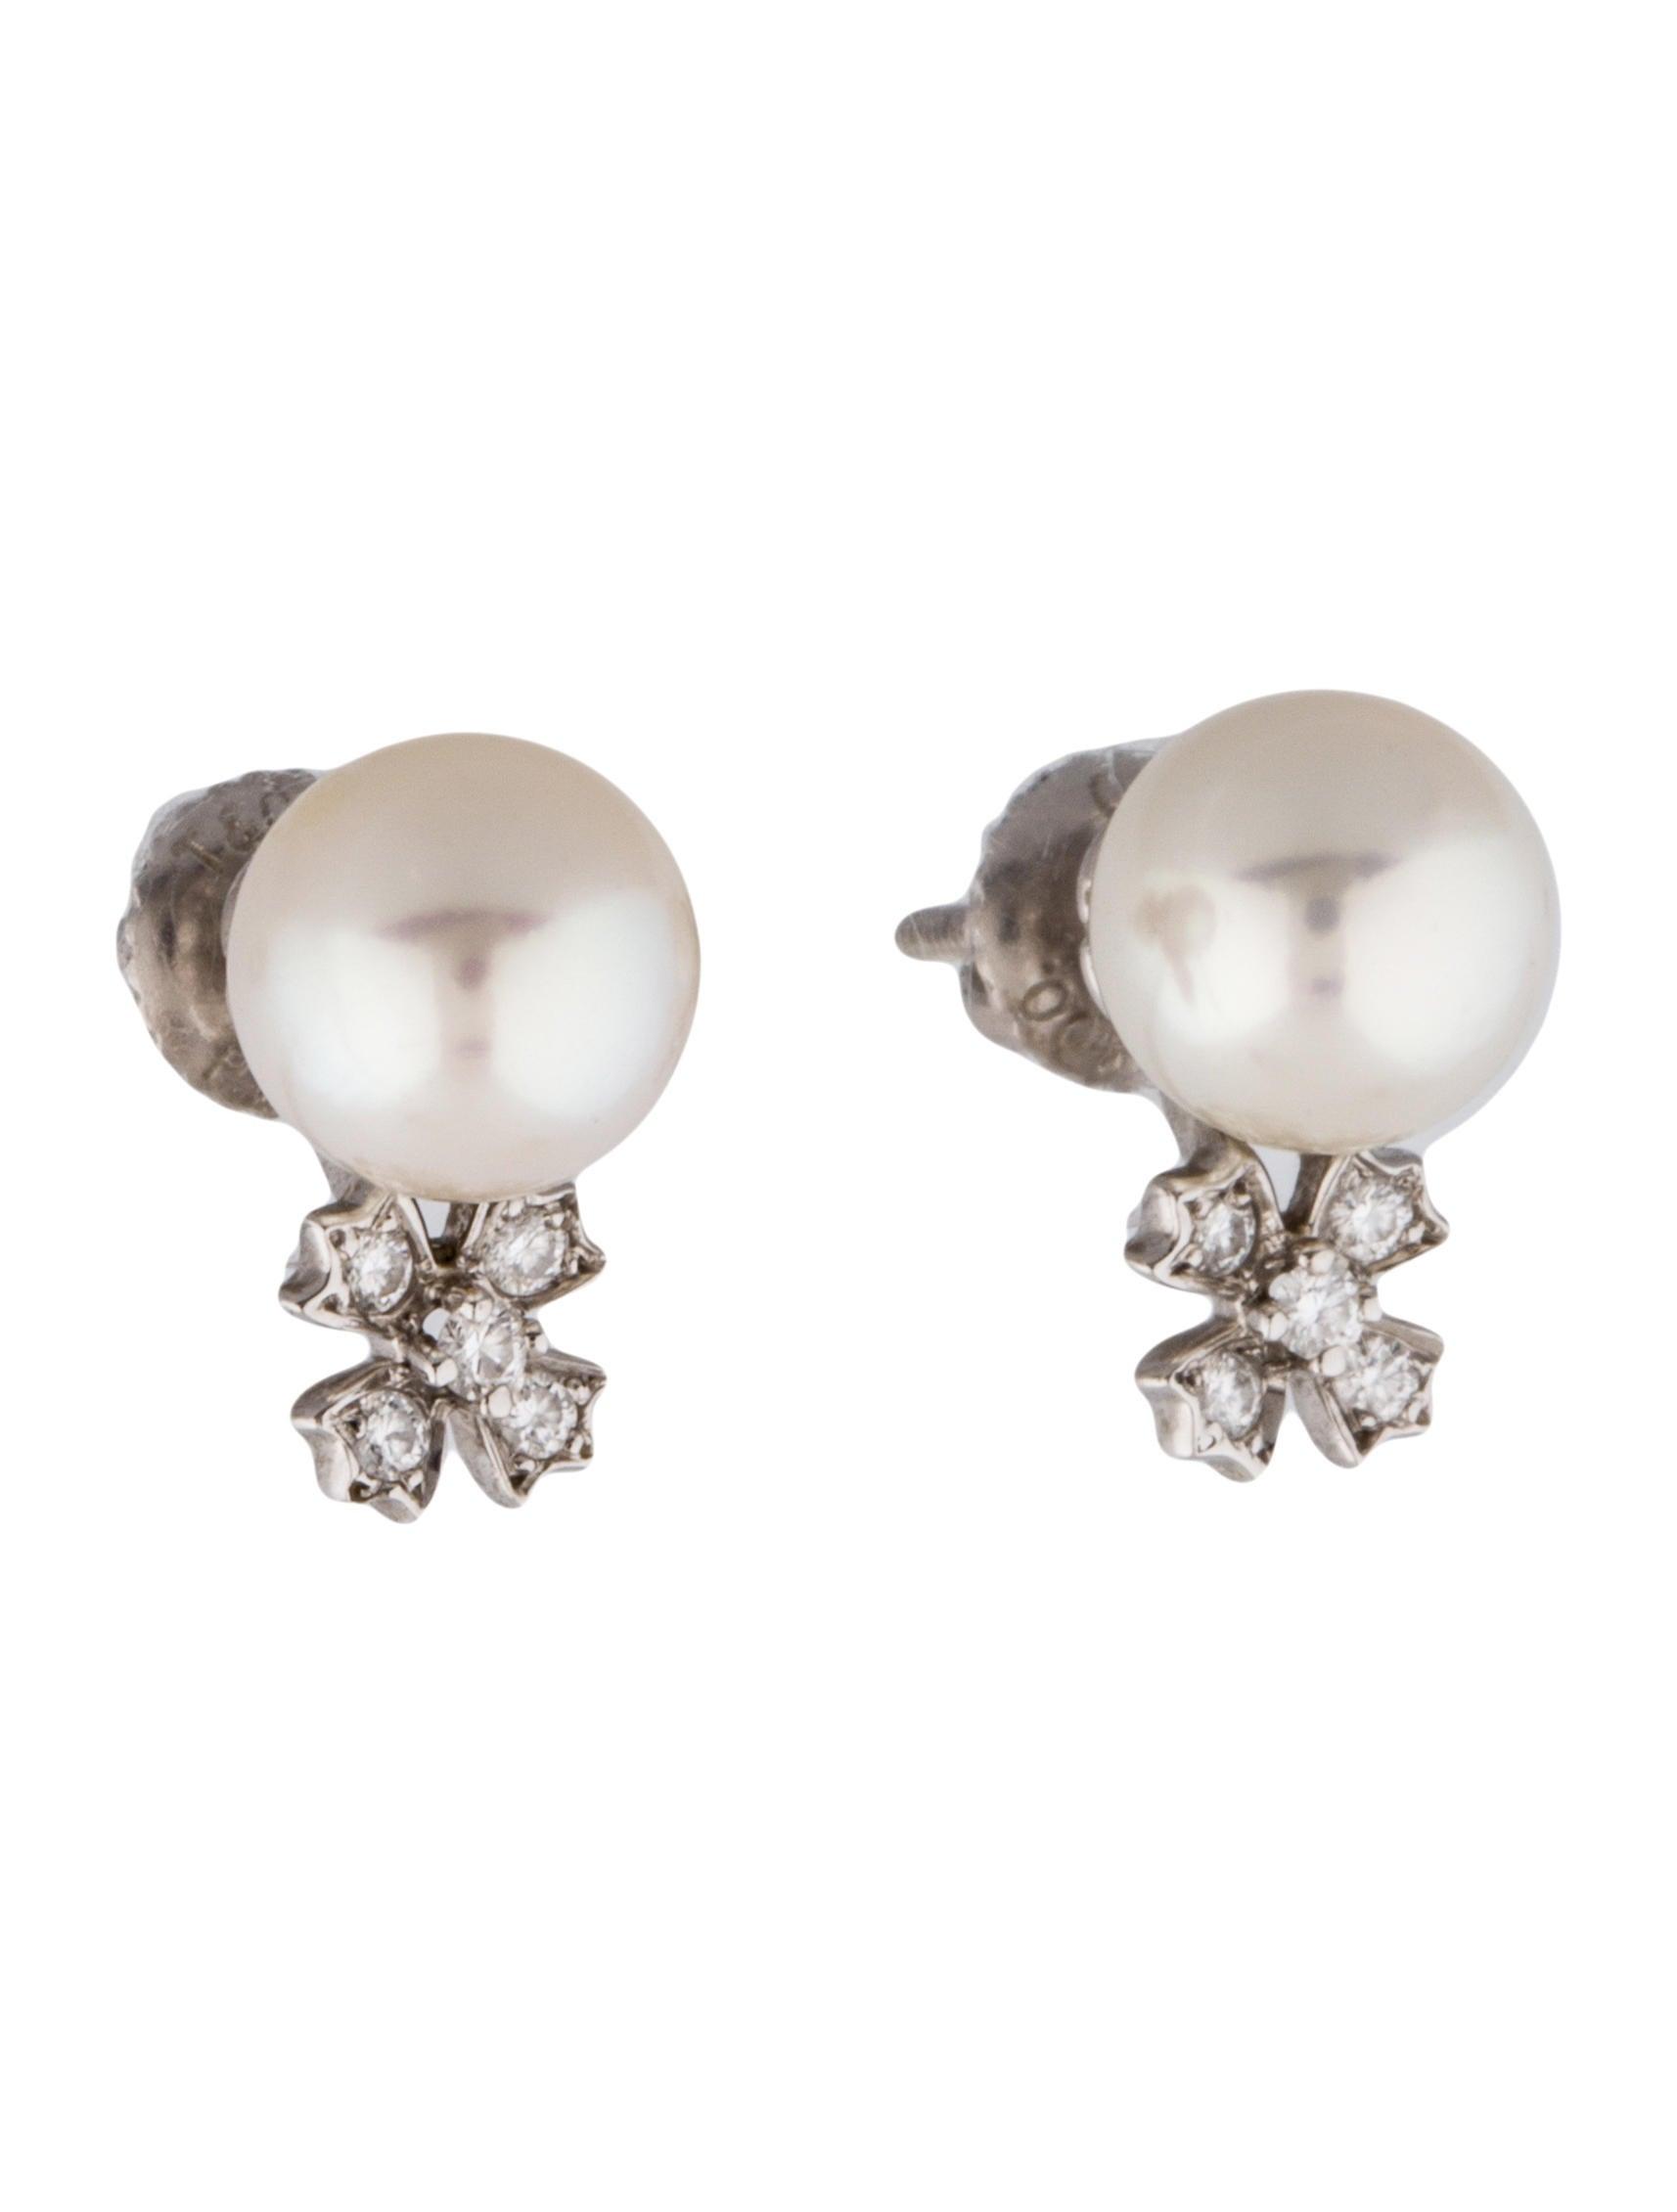 Tiffany & Co Platinum Akoya Pearl and Diamond Stud Earrings